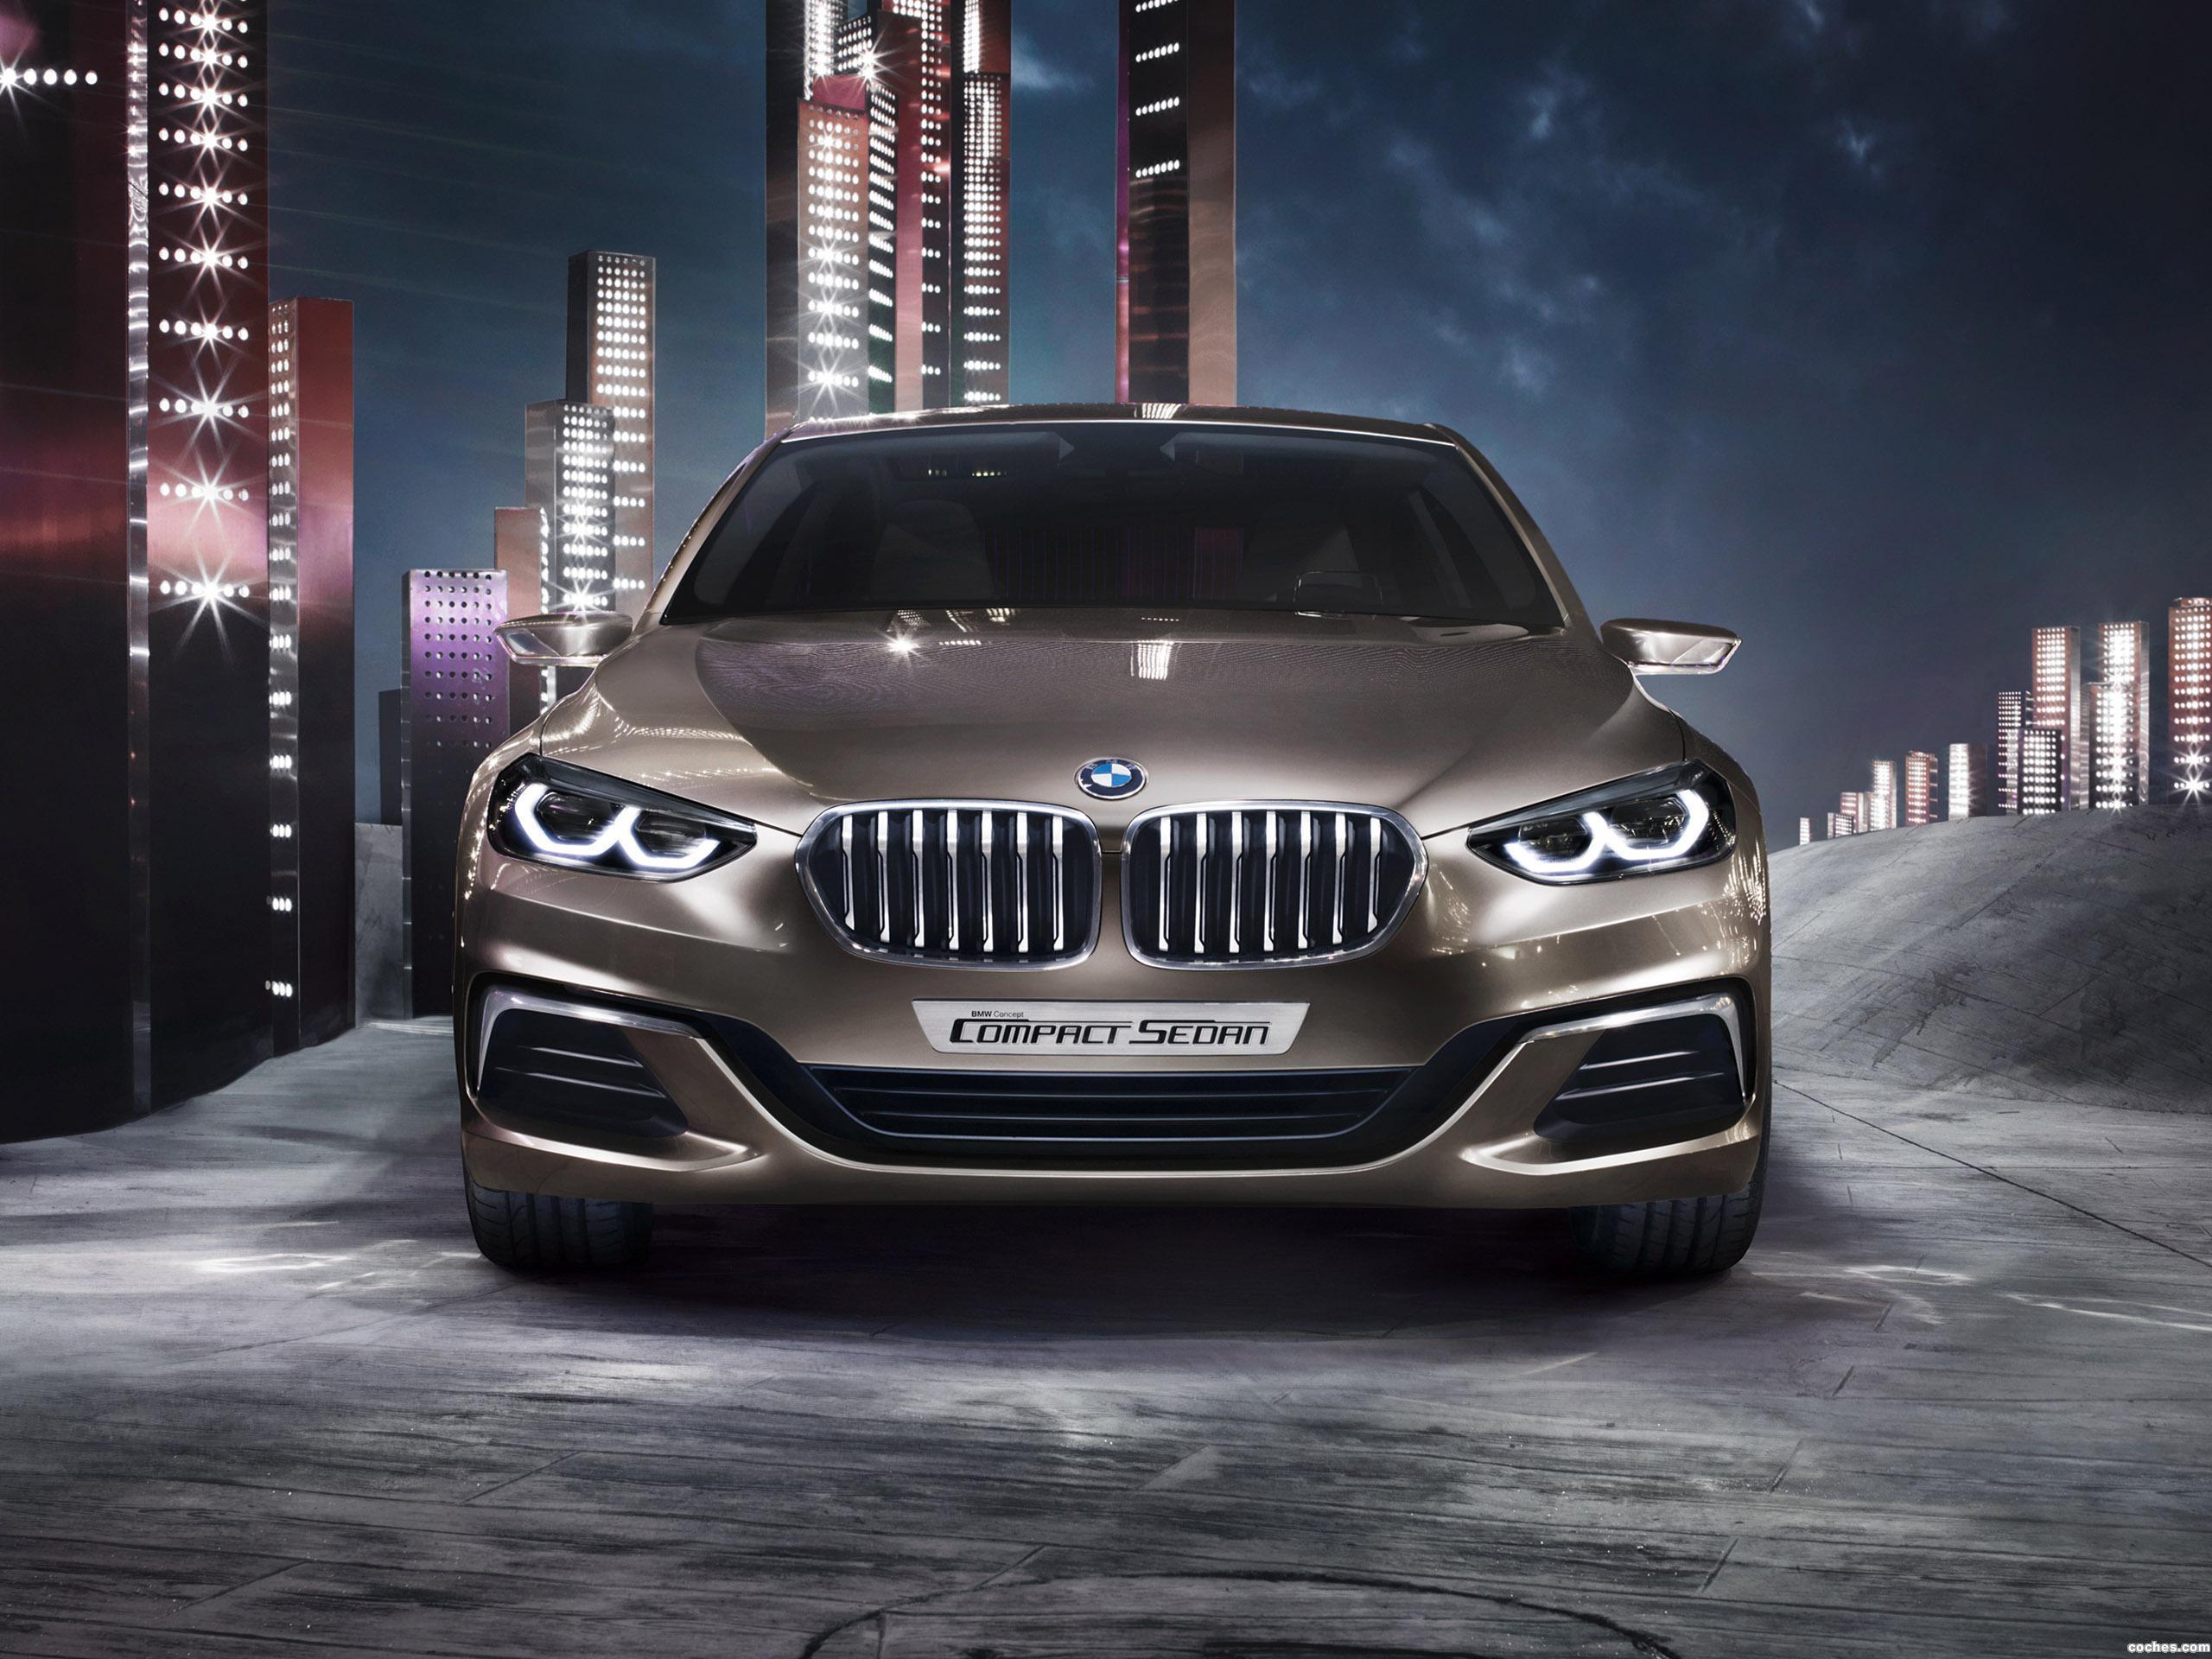 Foto 0 de BMW Concept Compact Sedan 2015